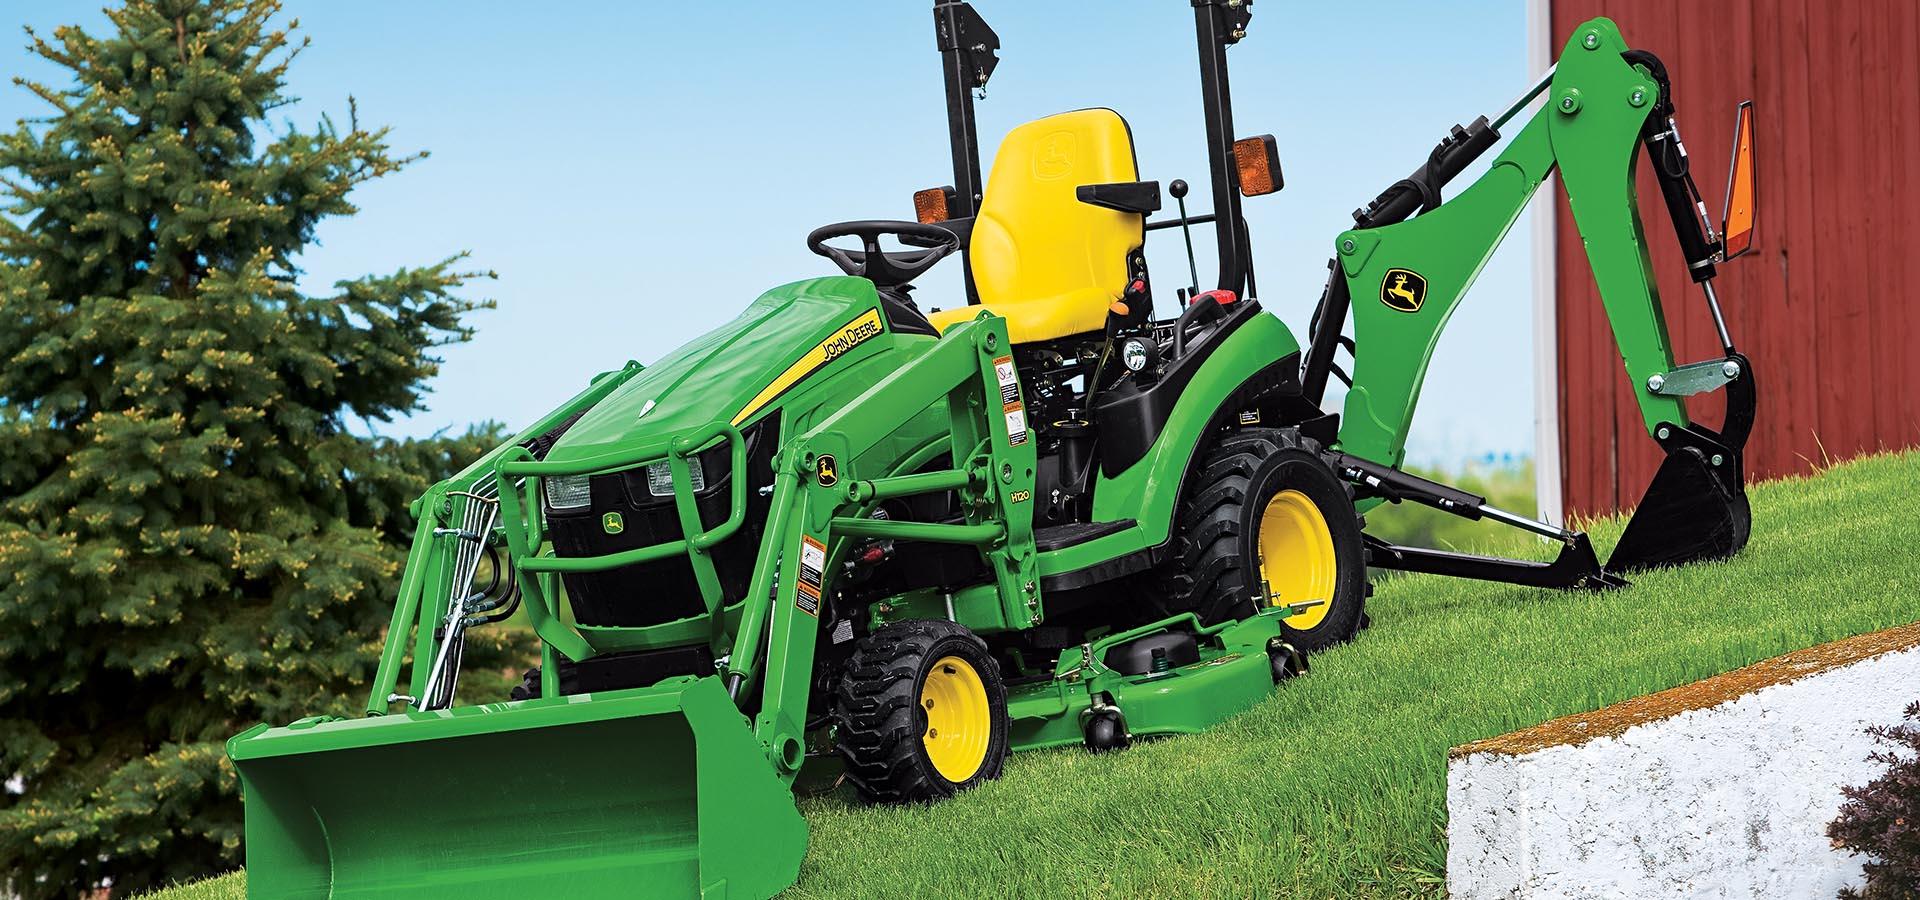 John Deere Tractors for Sale   Landscape Supply, Co.